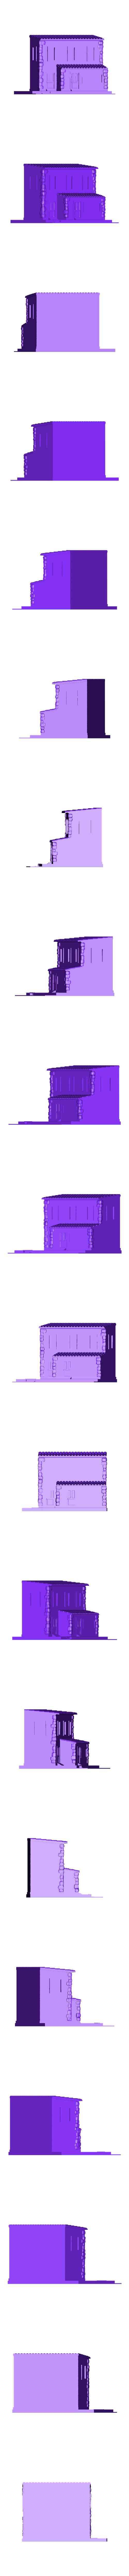 House.OBJ Descargar archivo OBJ Casa ( Tienda ) • Objeto imprimible en 3D, MatteoMoscatelli